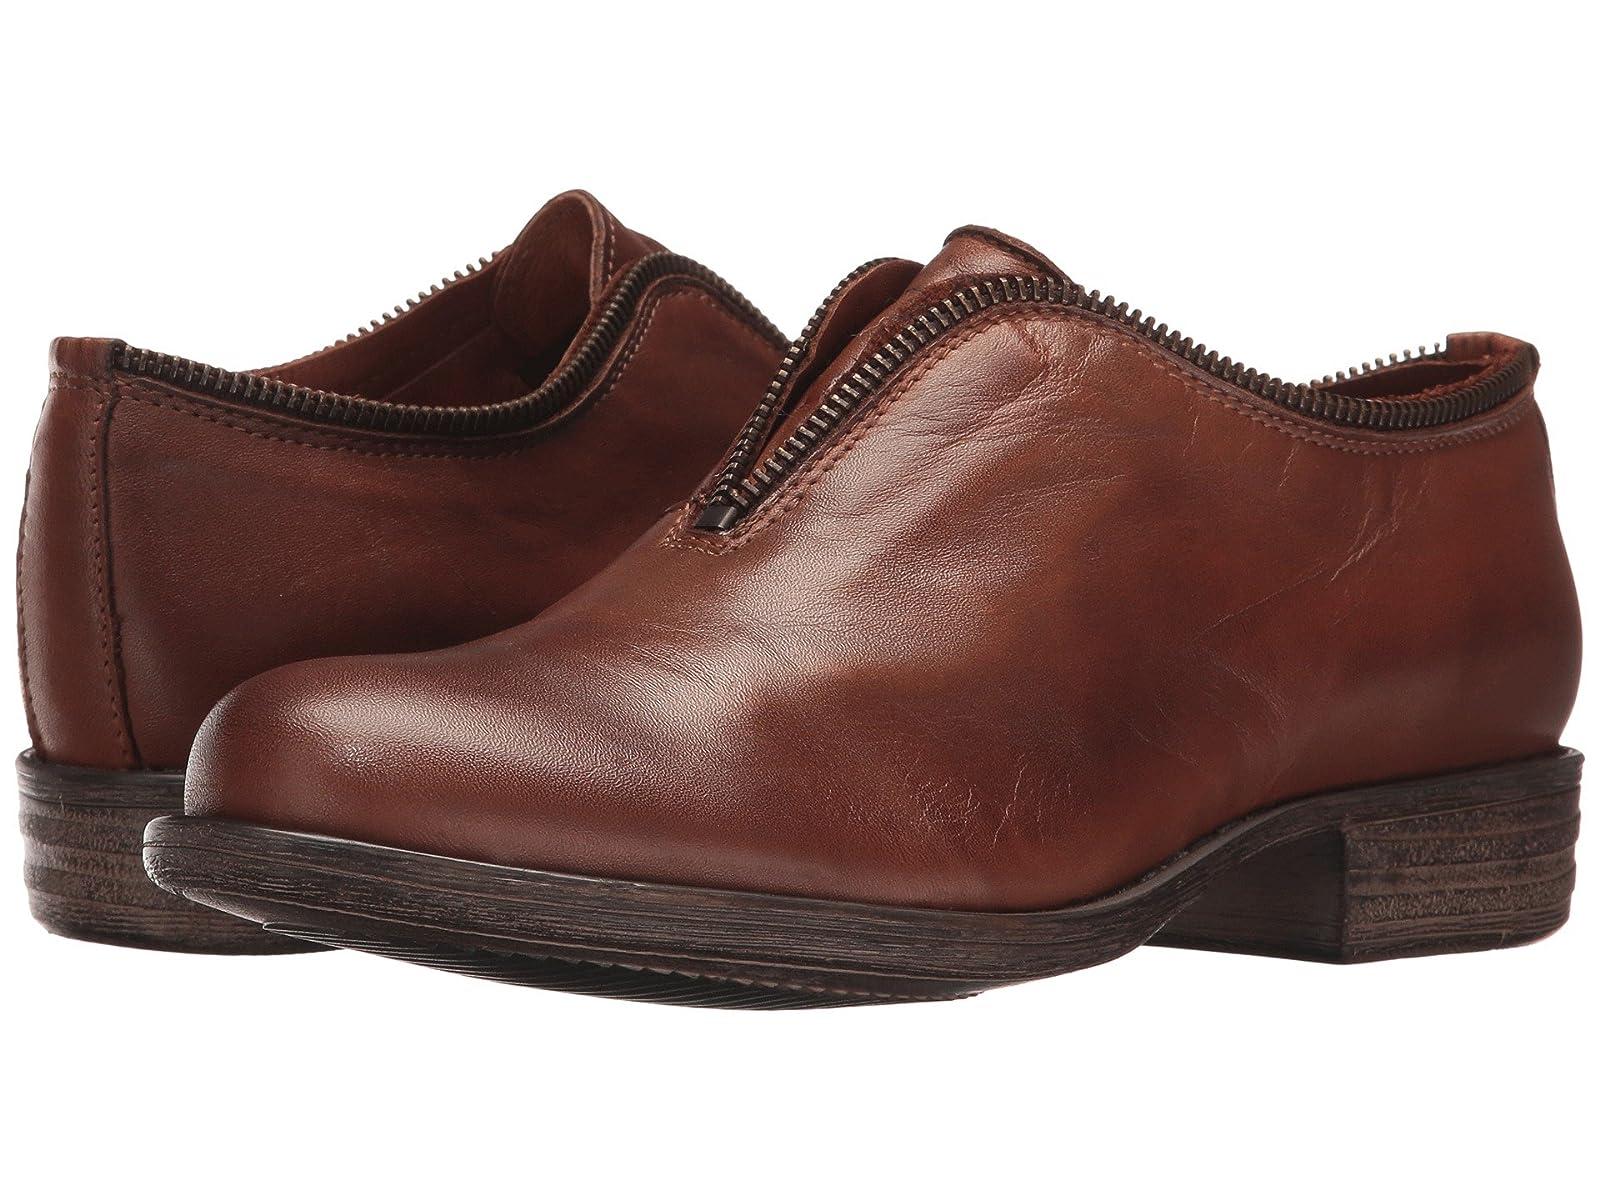 Miz Mooz LauralynCheap and distinctive eye-catching shoes